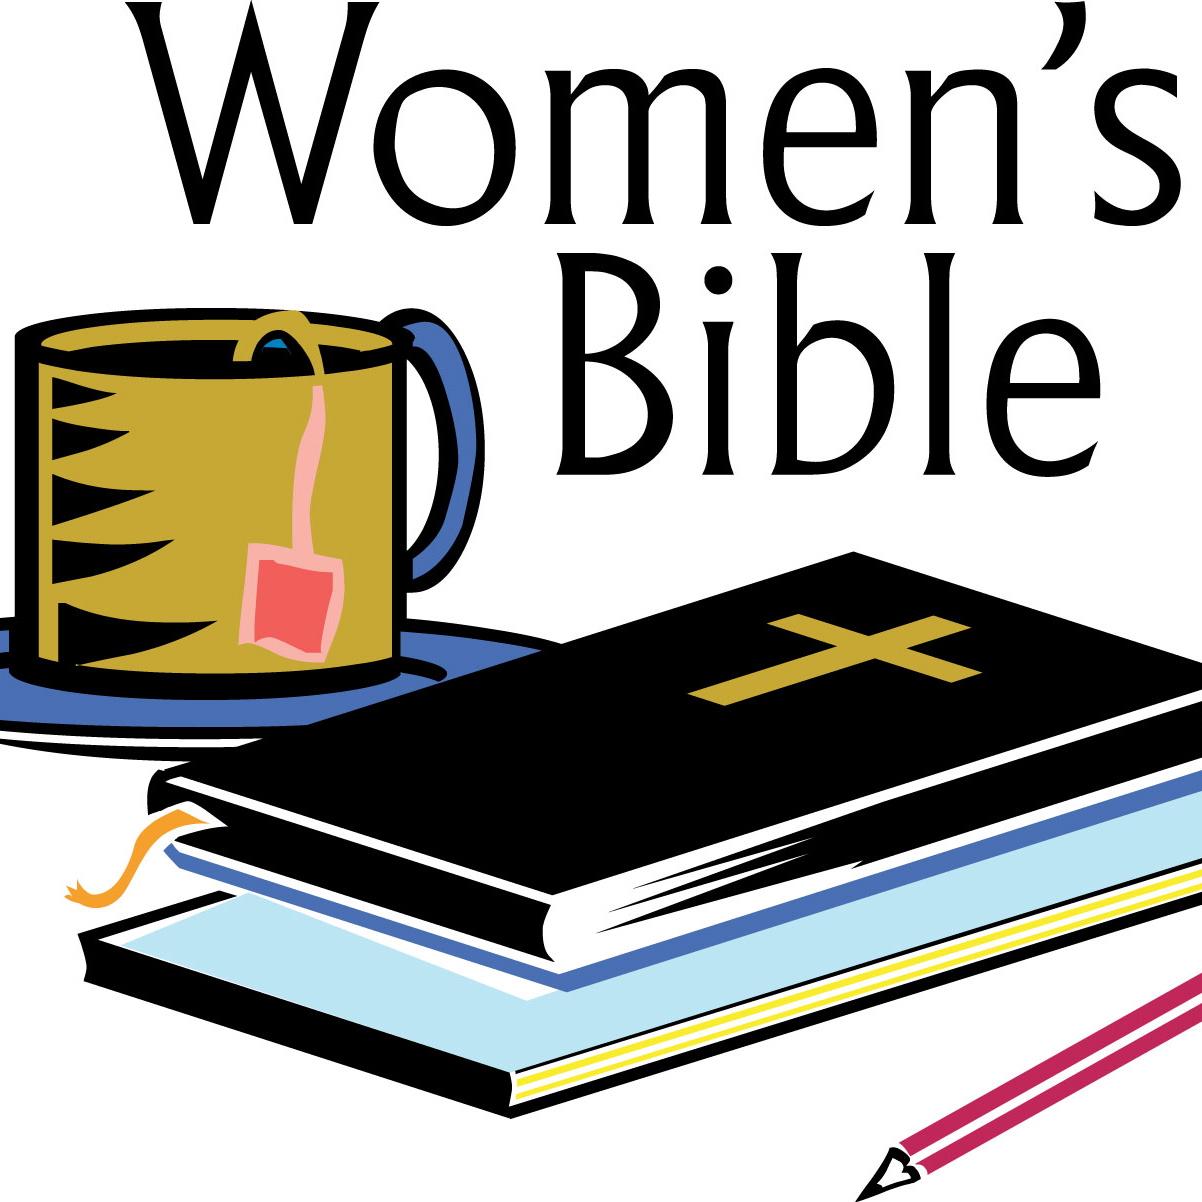 1202x1202 Bible Clip Art Free Clipart Image 1